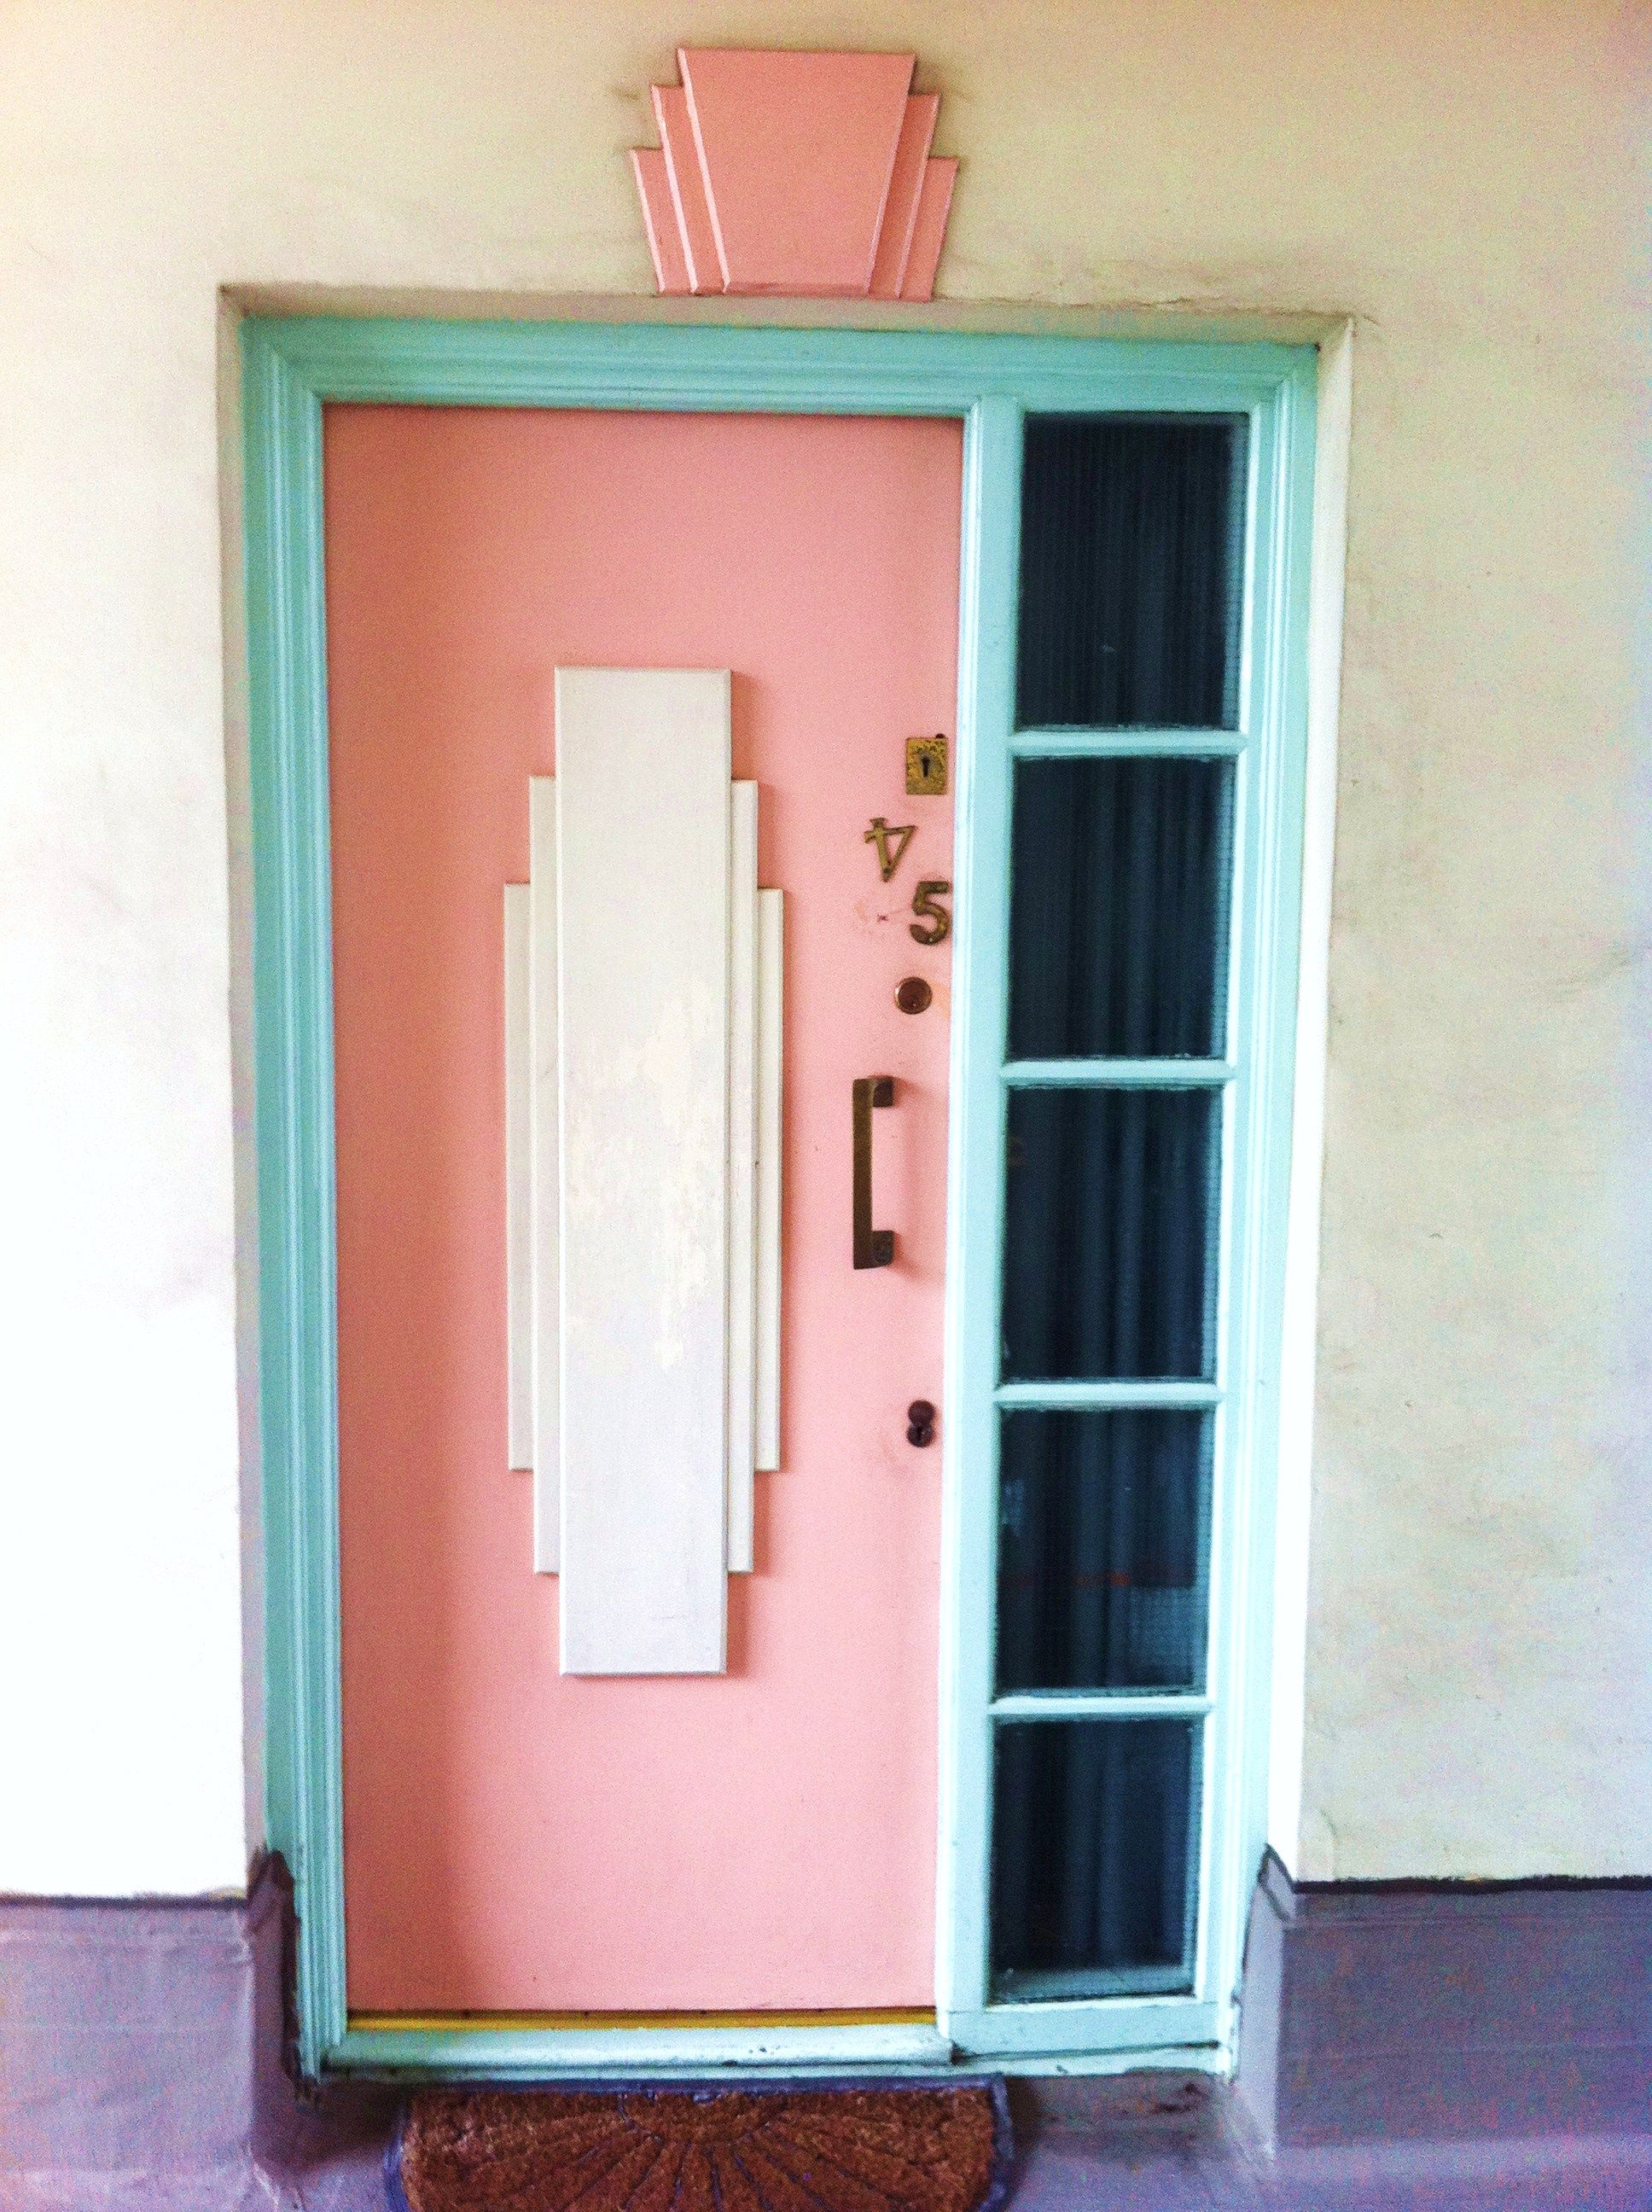 Art Deco Door Portsmouth Woo Embellishment Above Door Should Be Same Color As Frame